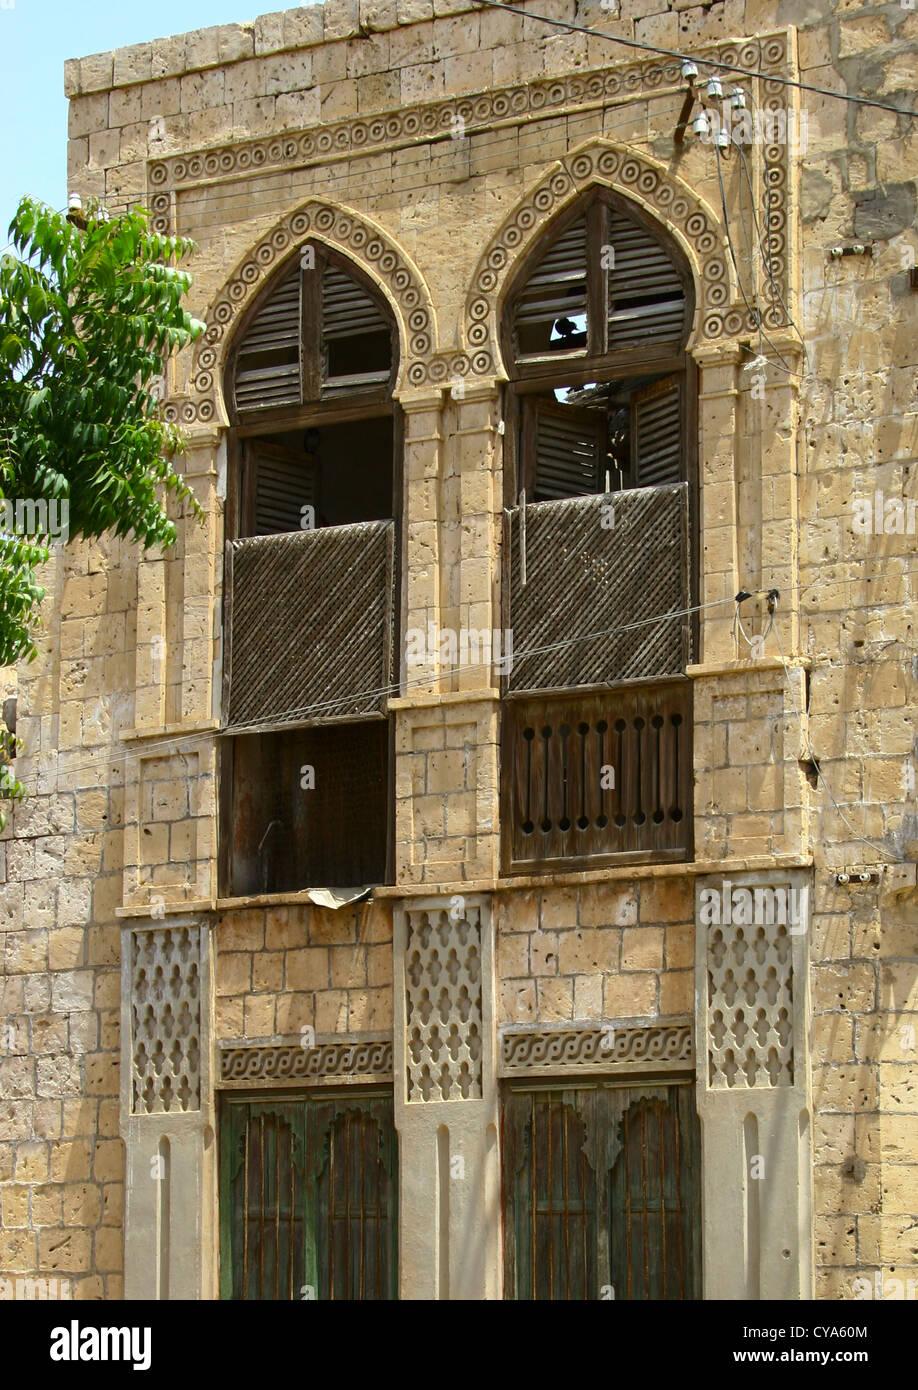 Ottoman Building In Massawa, Eritrea Stock Photo